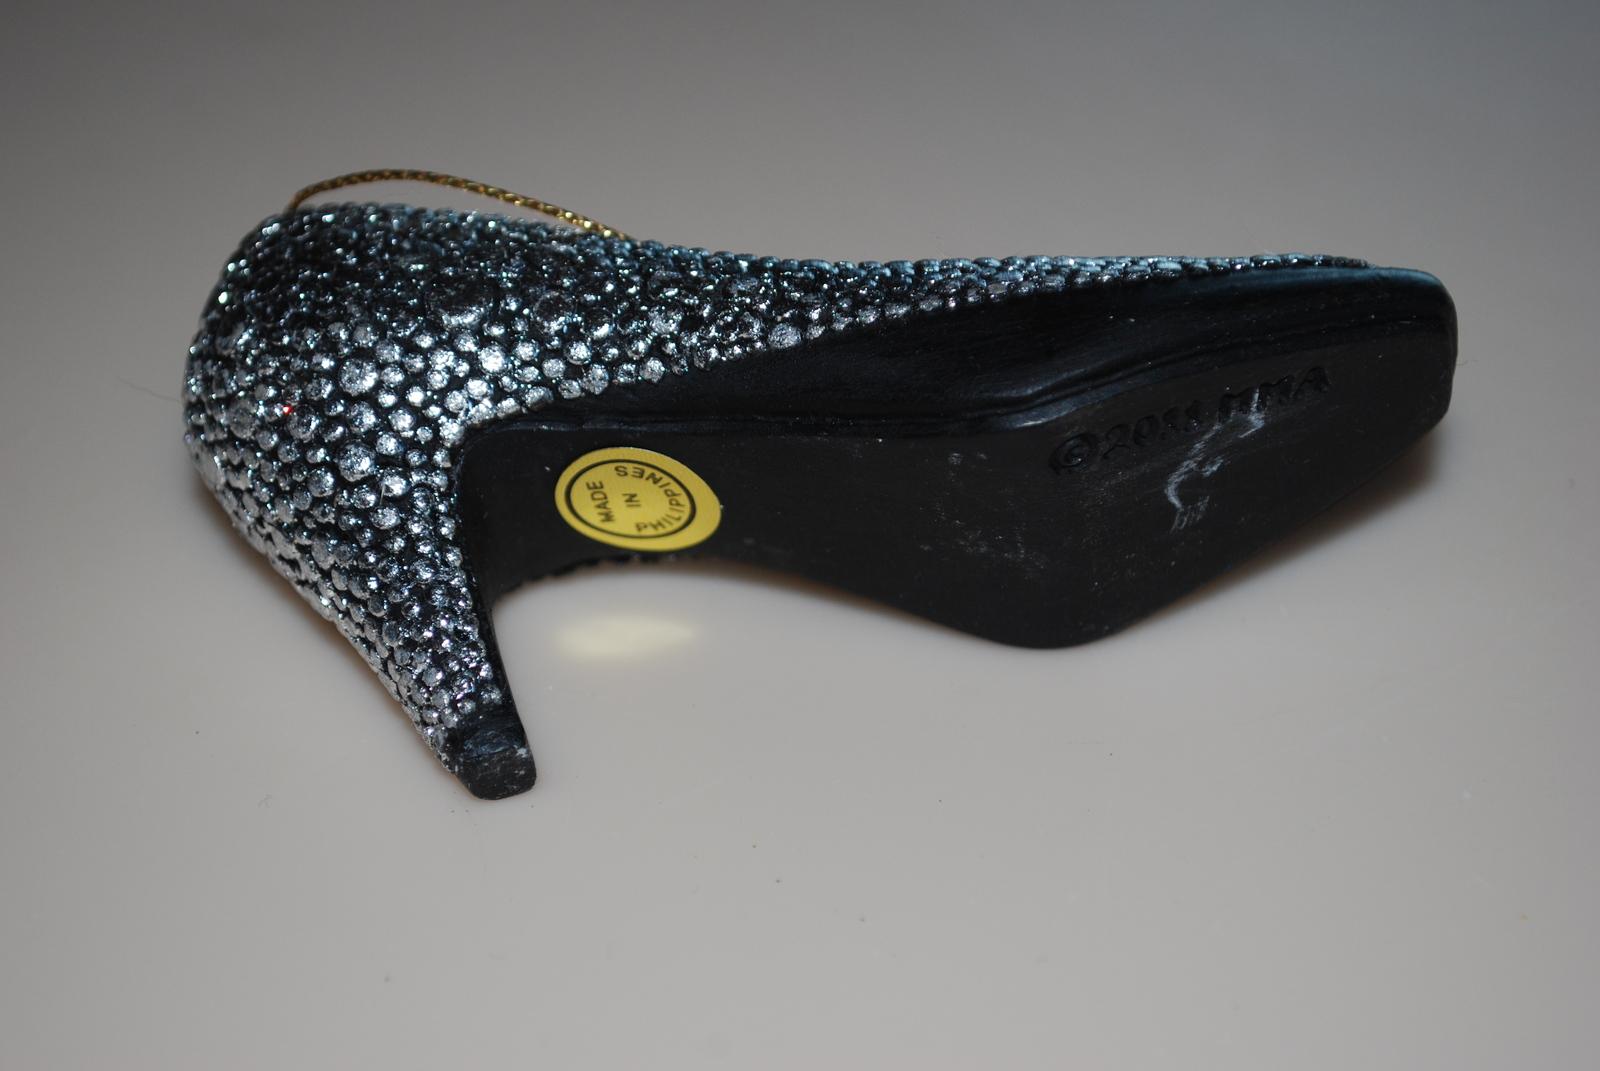 Metropolitan Museum of Art MMA Christmas Shoe Ornament 2011 Silver Heel